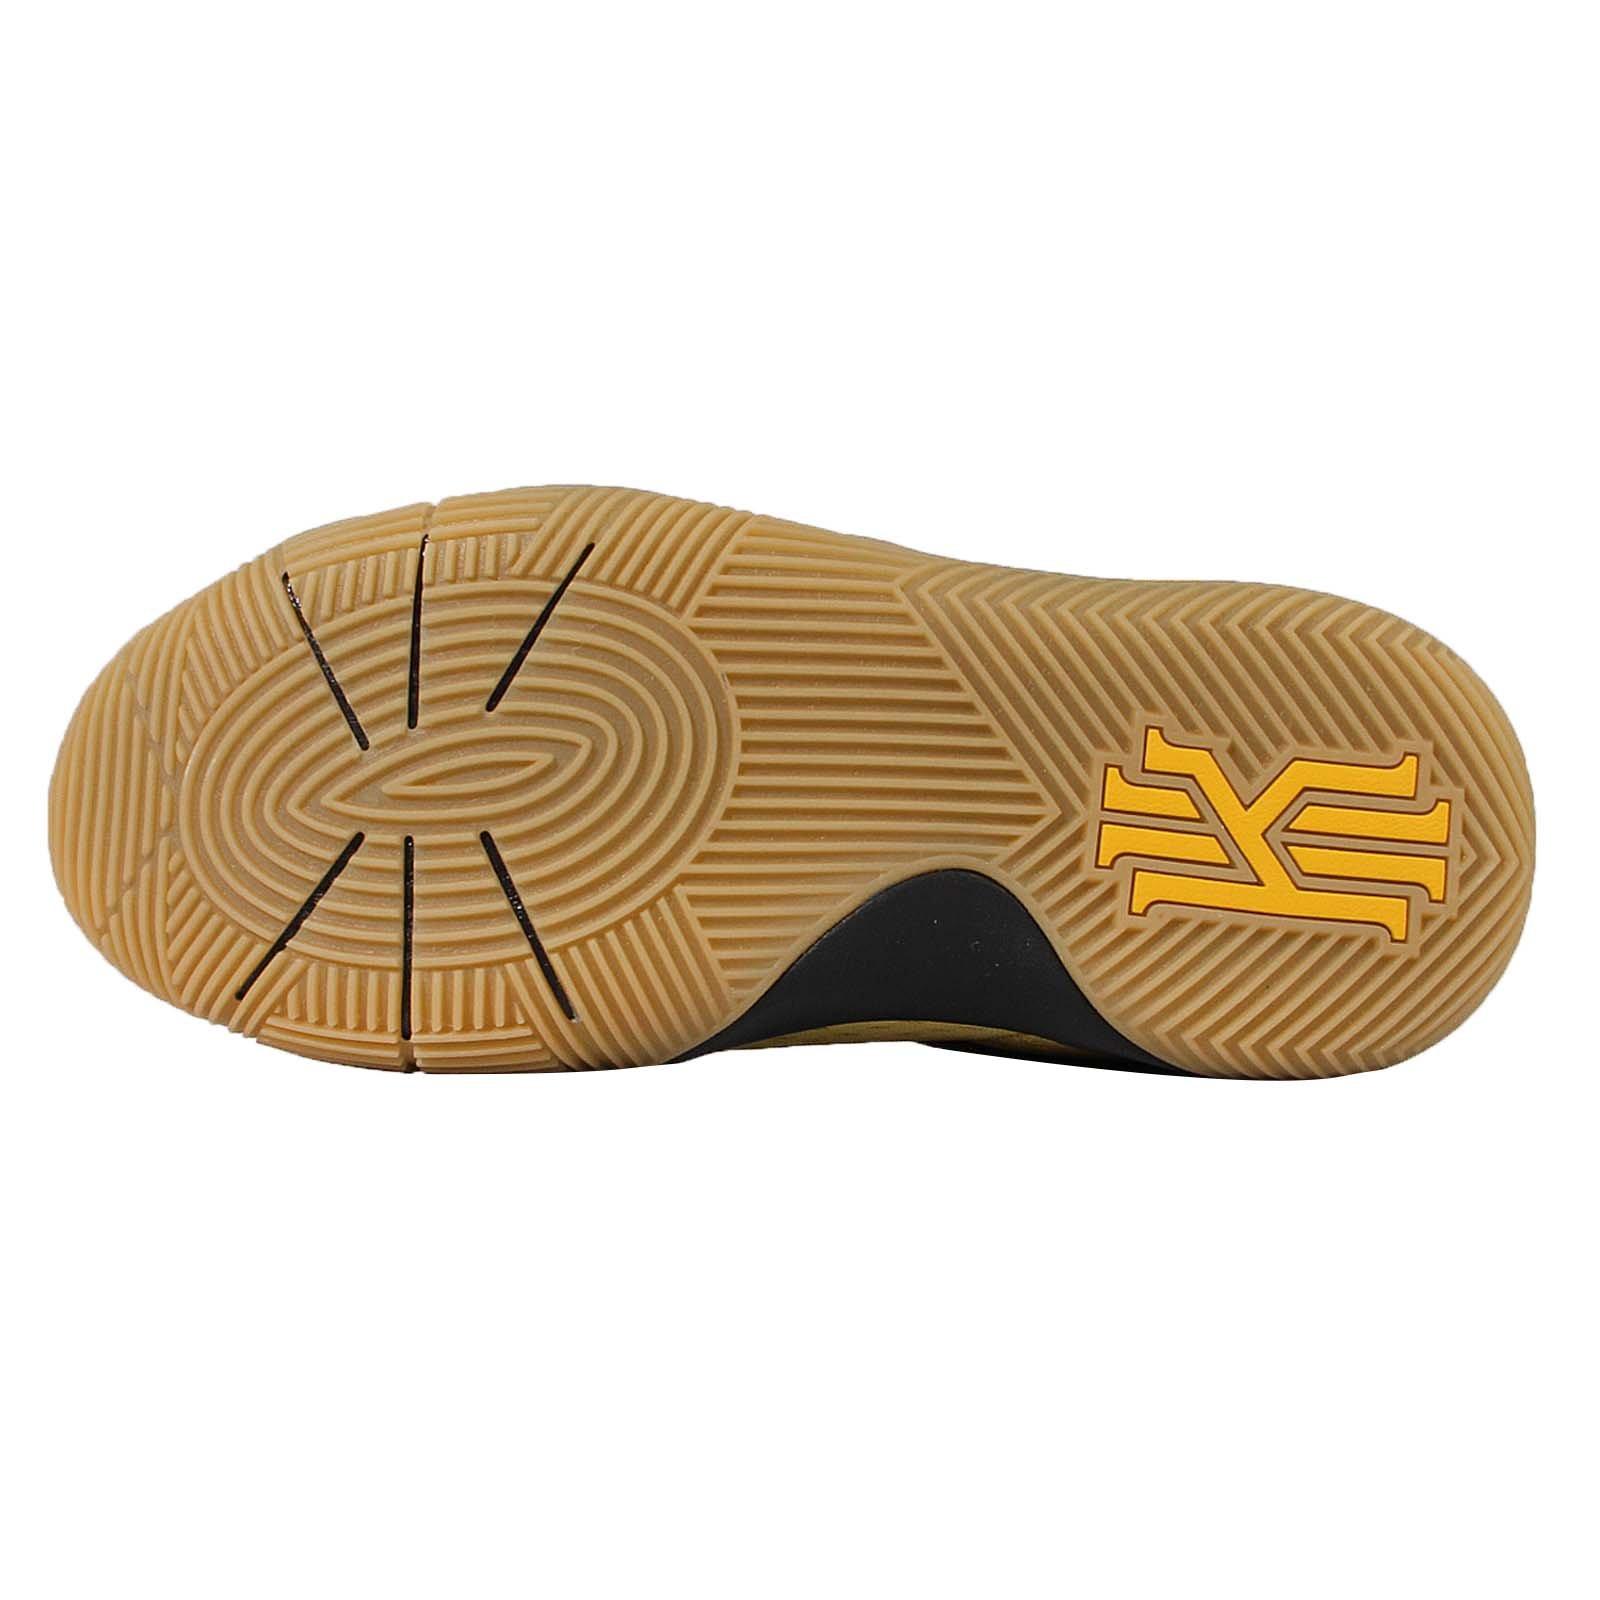 Nike Kids Kyrie 2 AS GS, ALL STAR-CELERY/VARSITY MAIZE-BLACK, Youth Size 6 by Nike (Image #5)